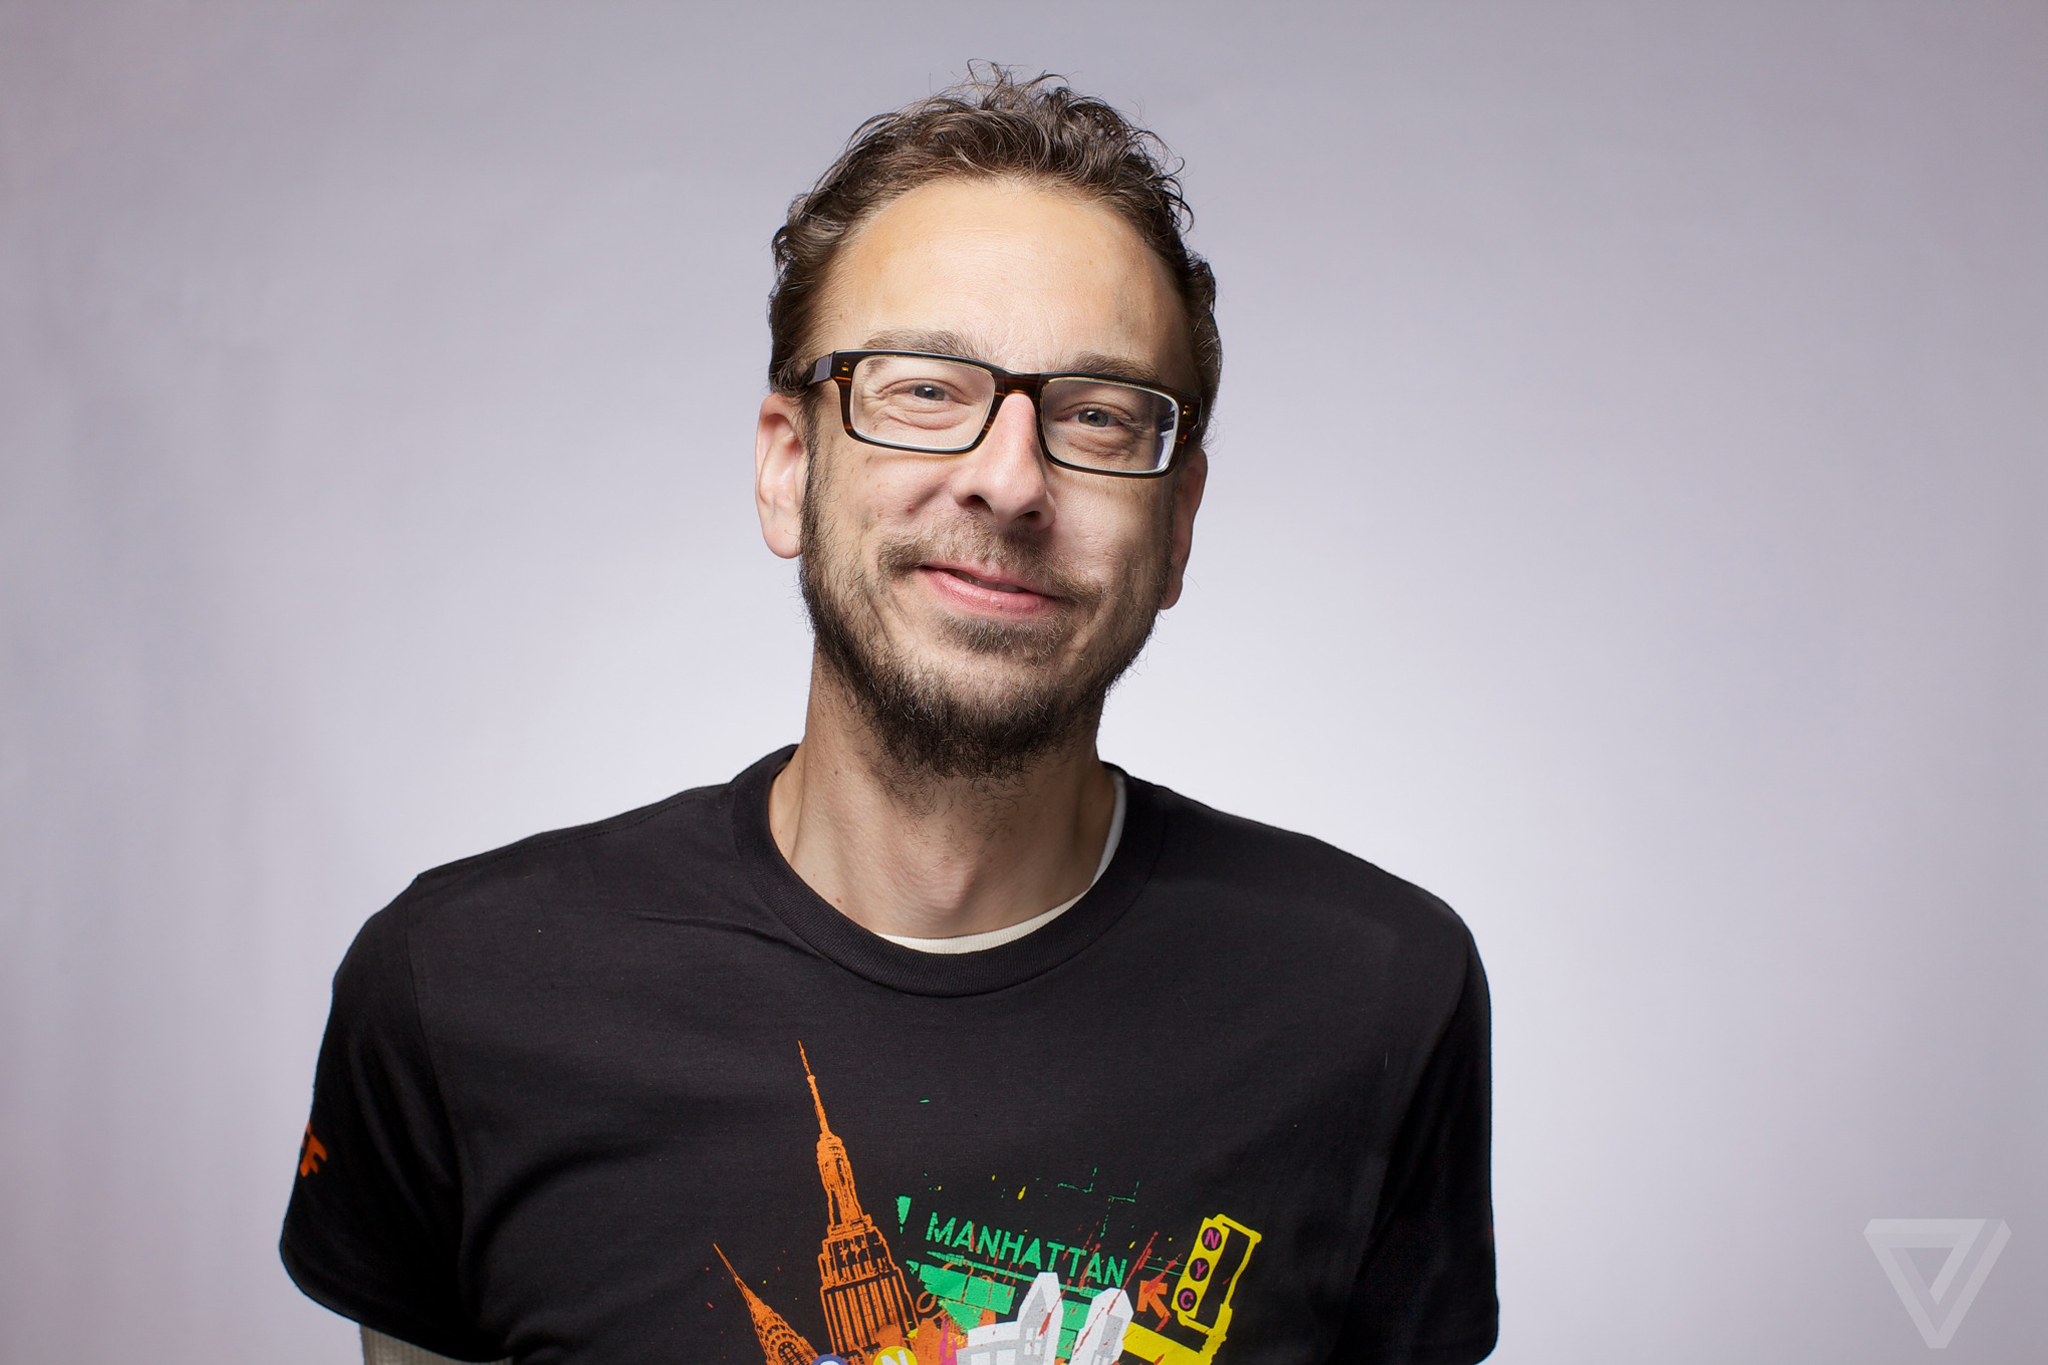 New York Comic Con's Lance Fensterman